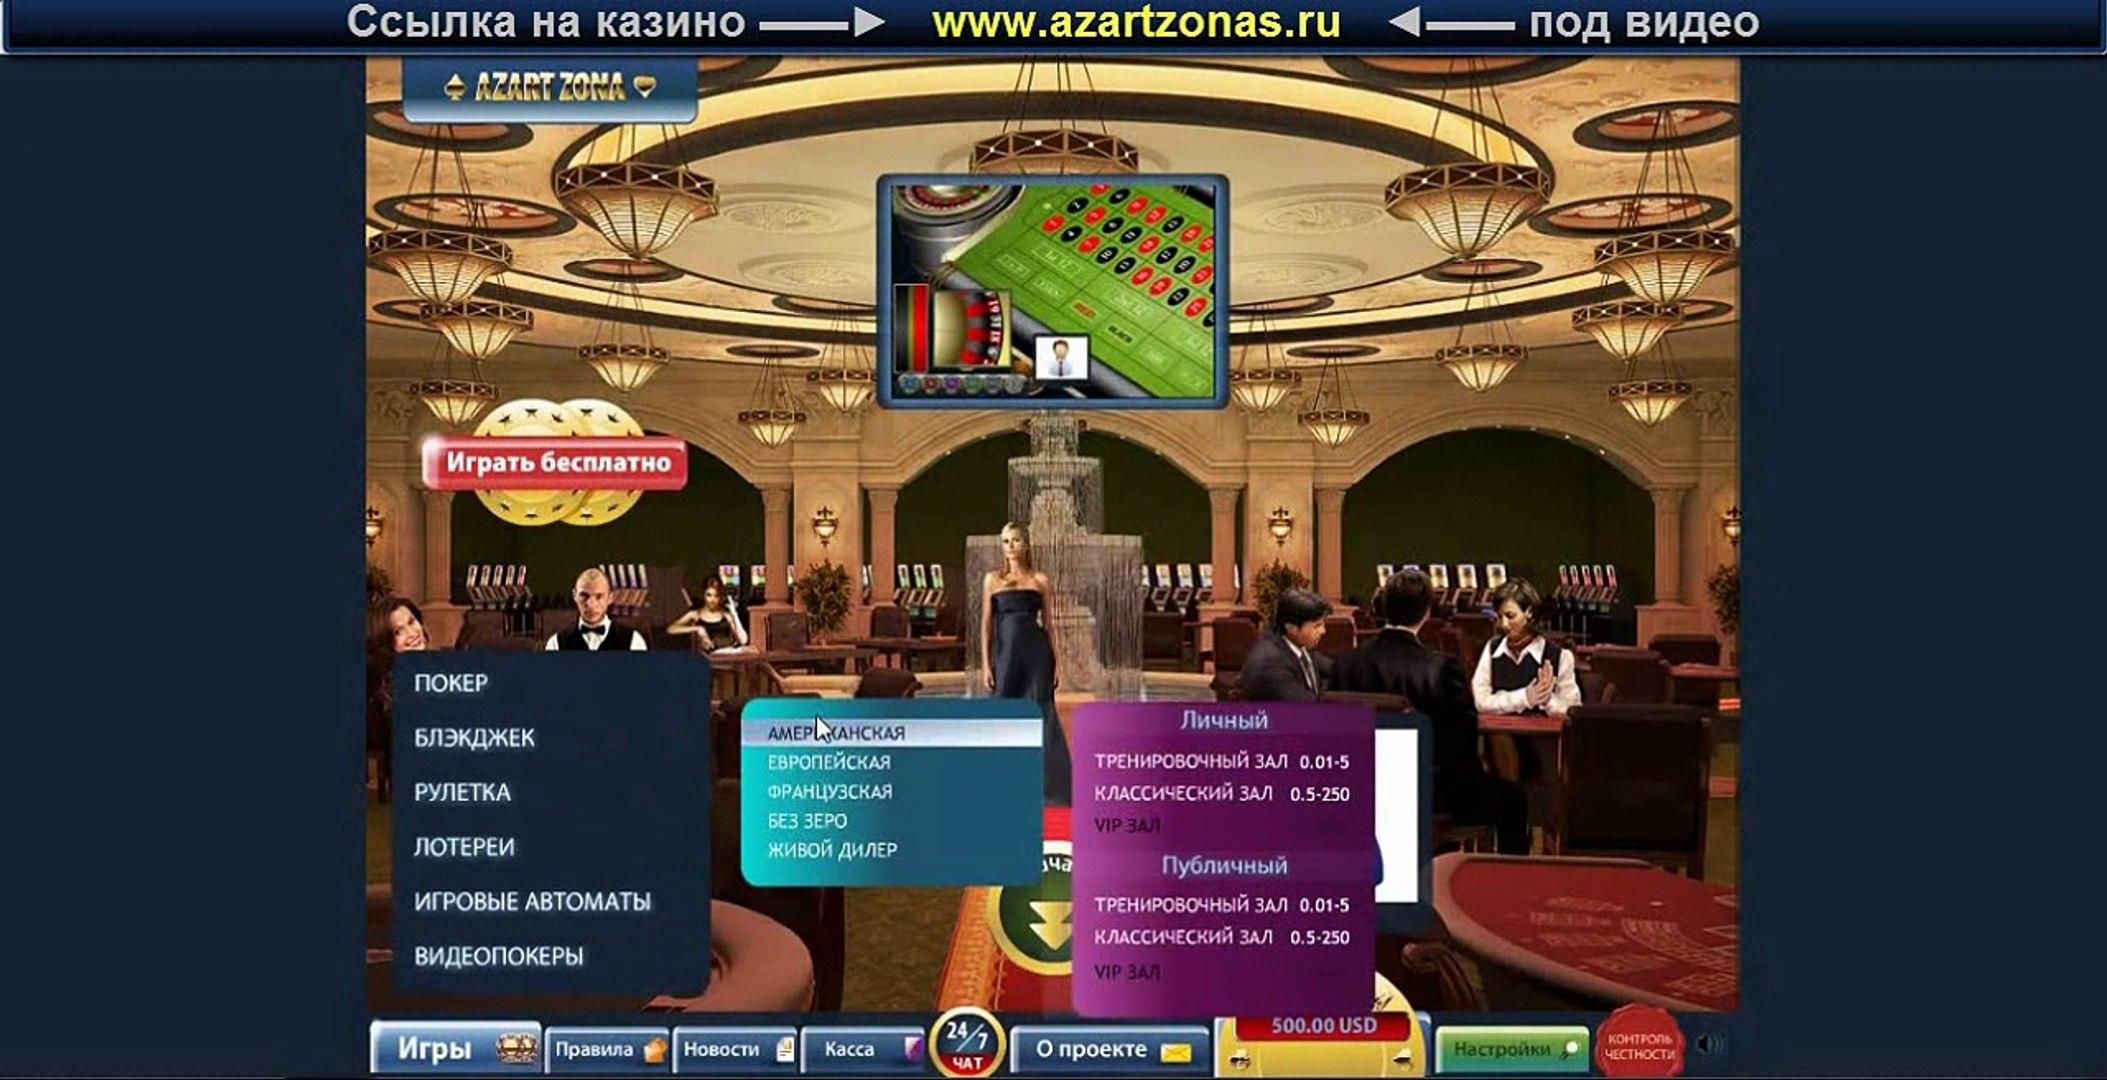 zona онлайн казино azart